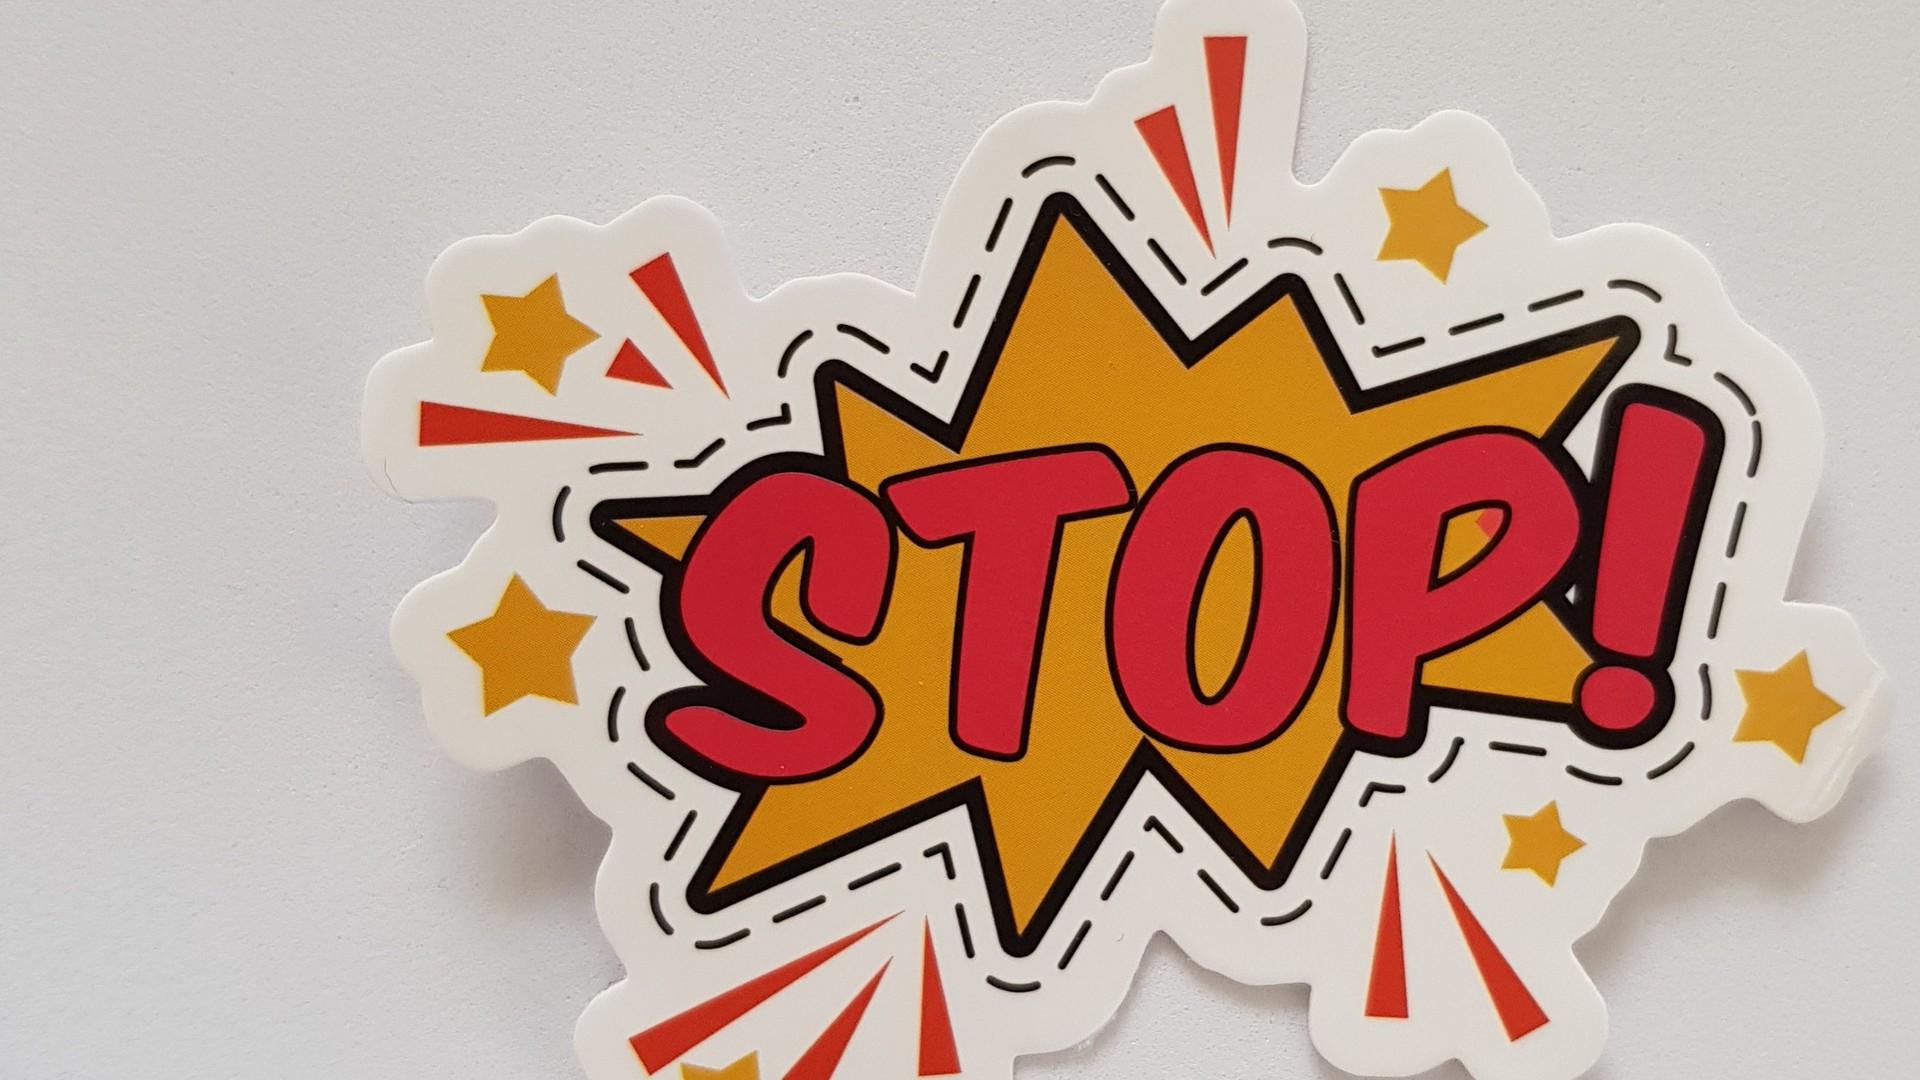 Stopp-Abwarten-Illustration.jpg